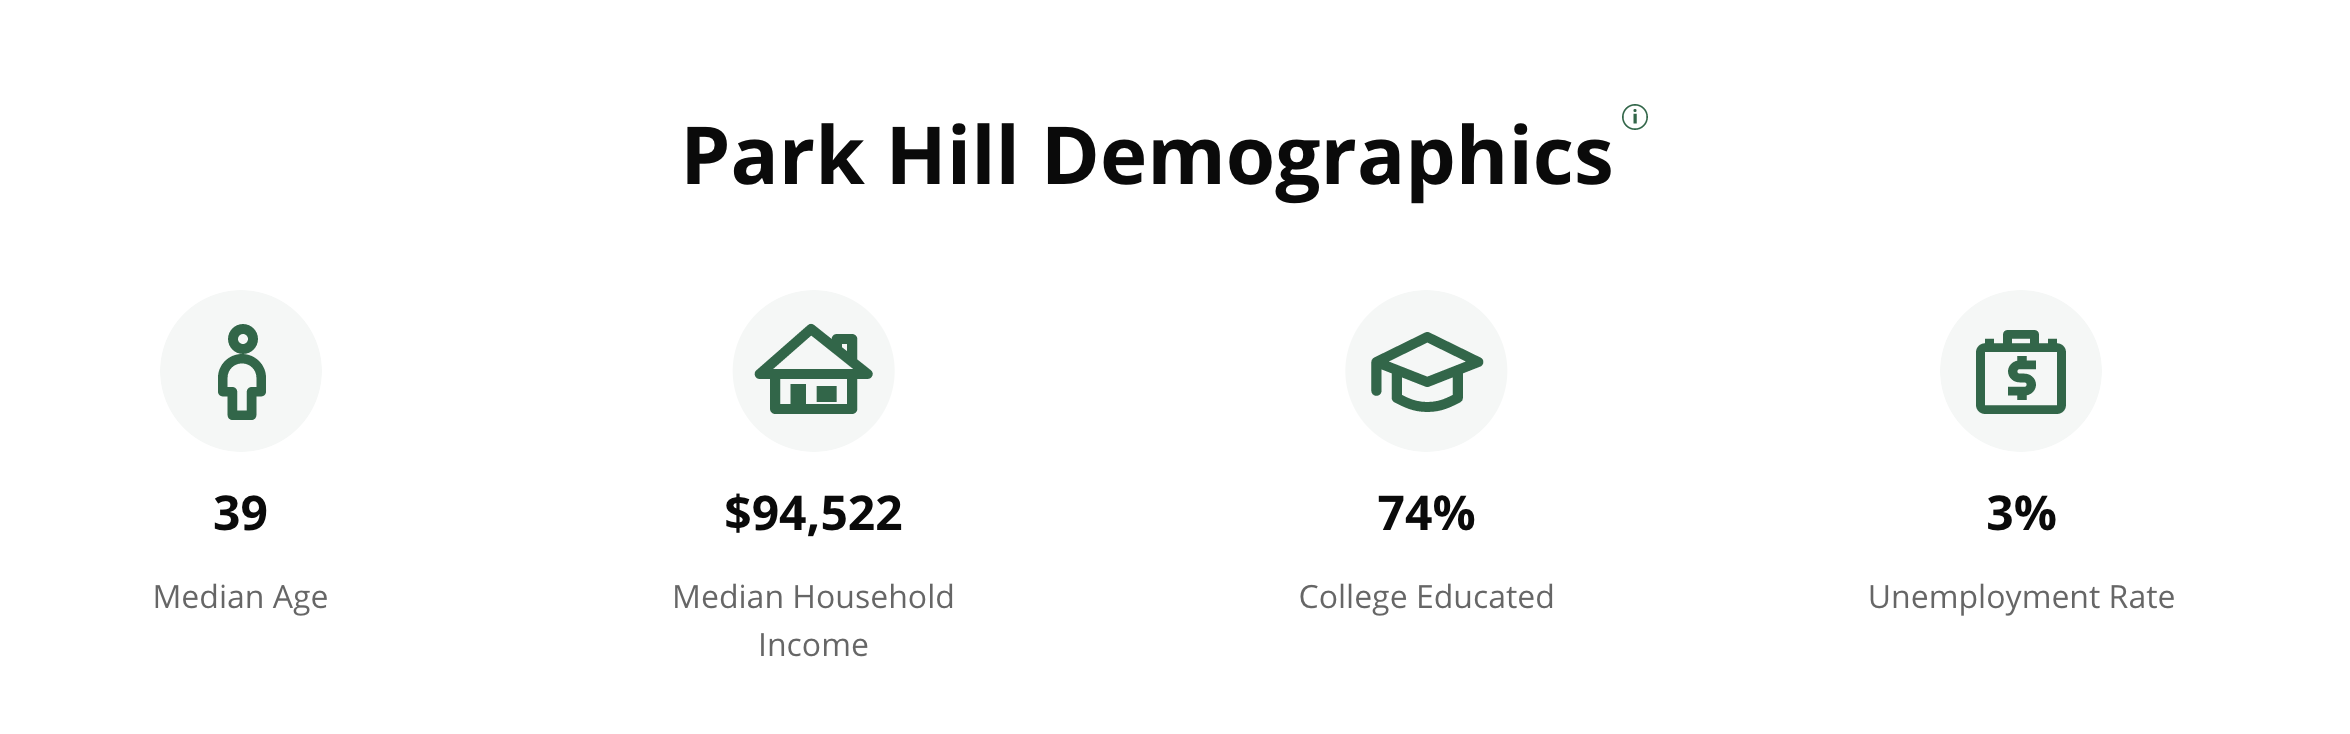 Park Hill Dempgraphics